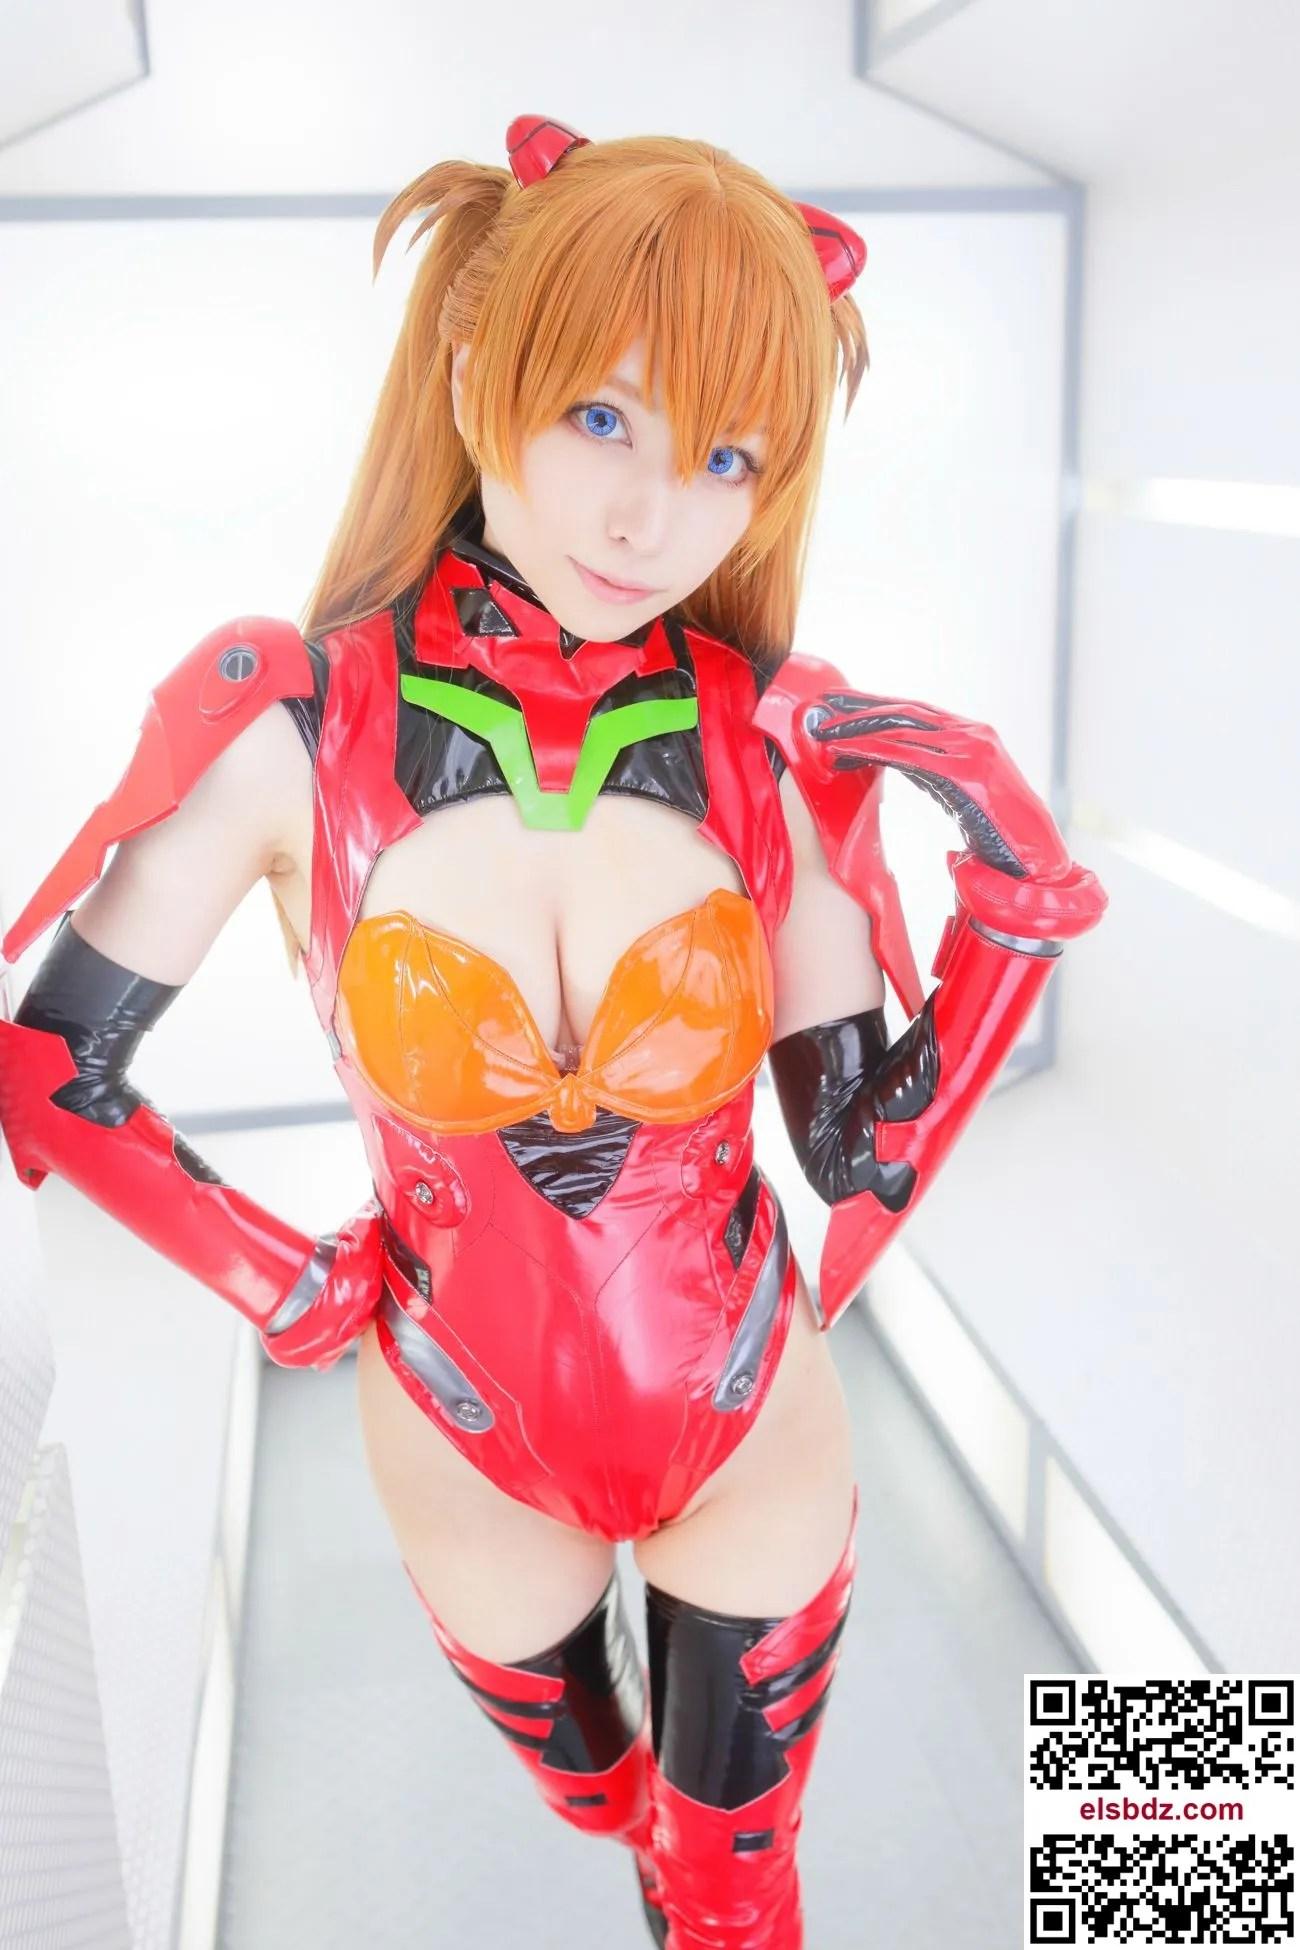 Cosplay みやこどんぶり みやこりお Asuka 2nd插图(10)